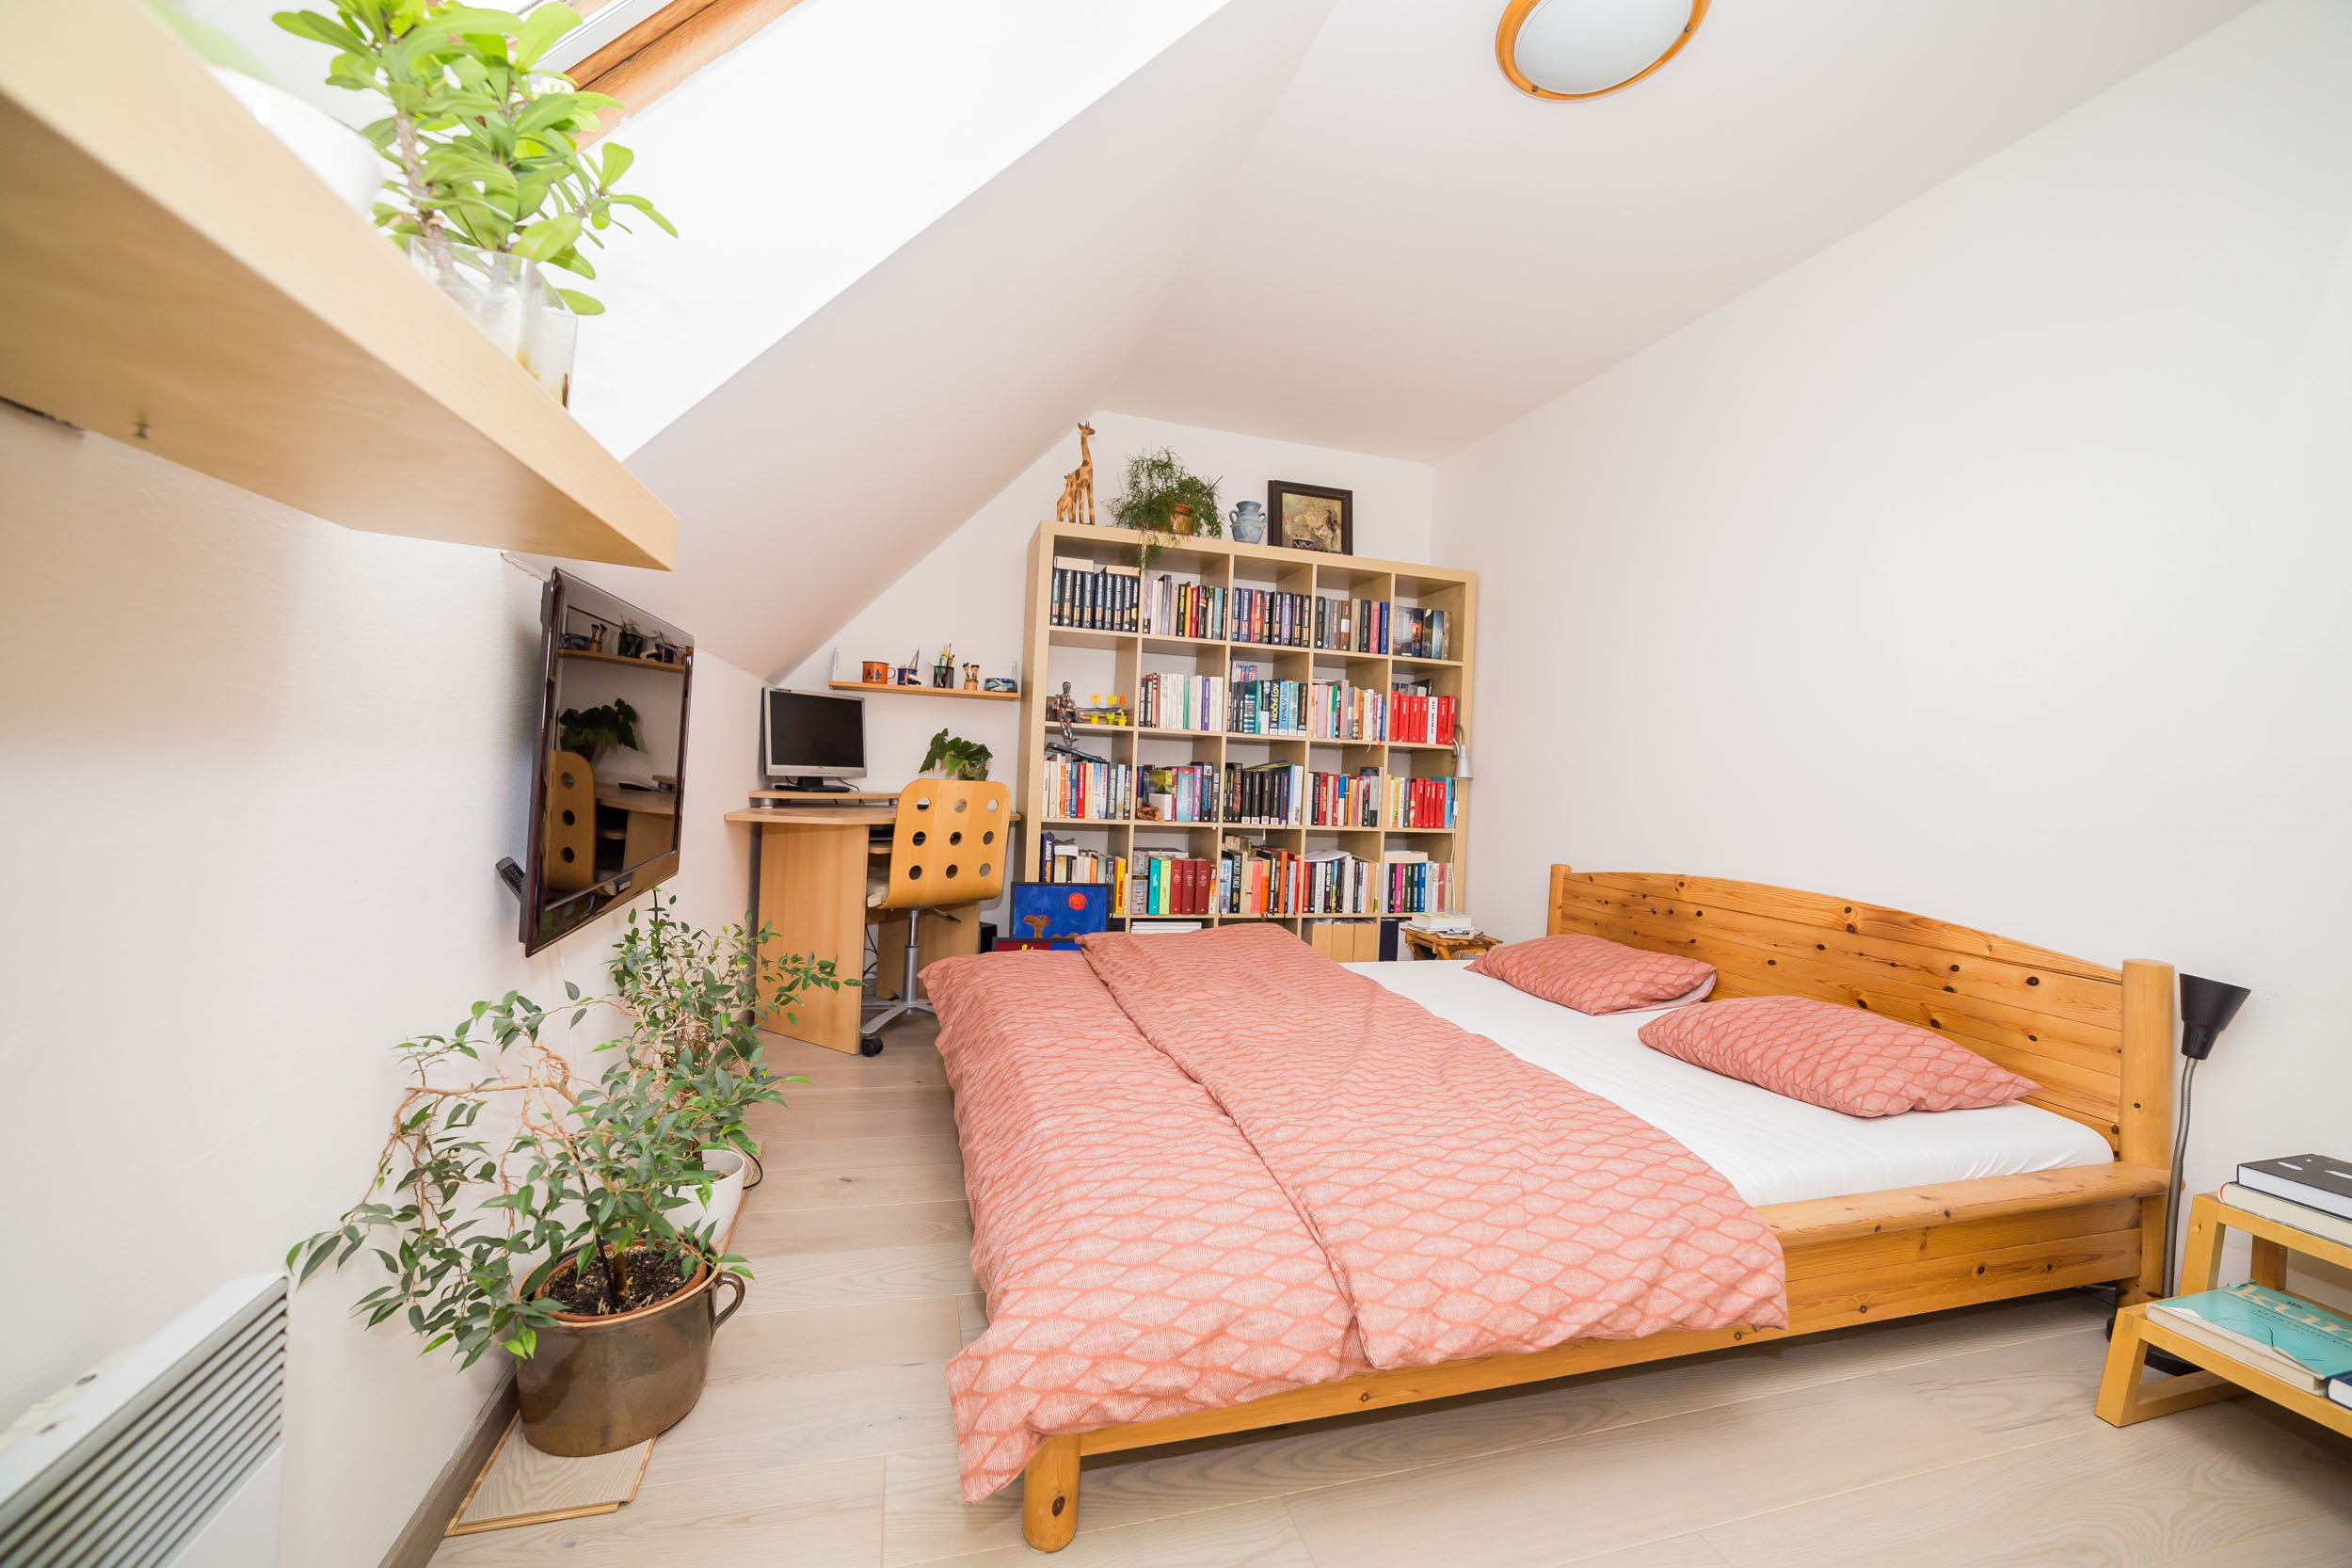 opava reality knihovna postel kvetina svetlo radiator televize pocitac zirafa police stul zidle